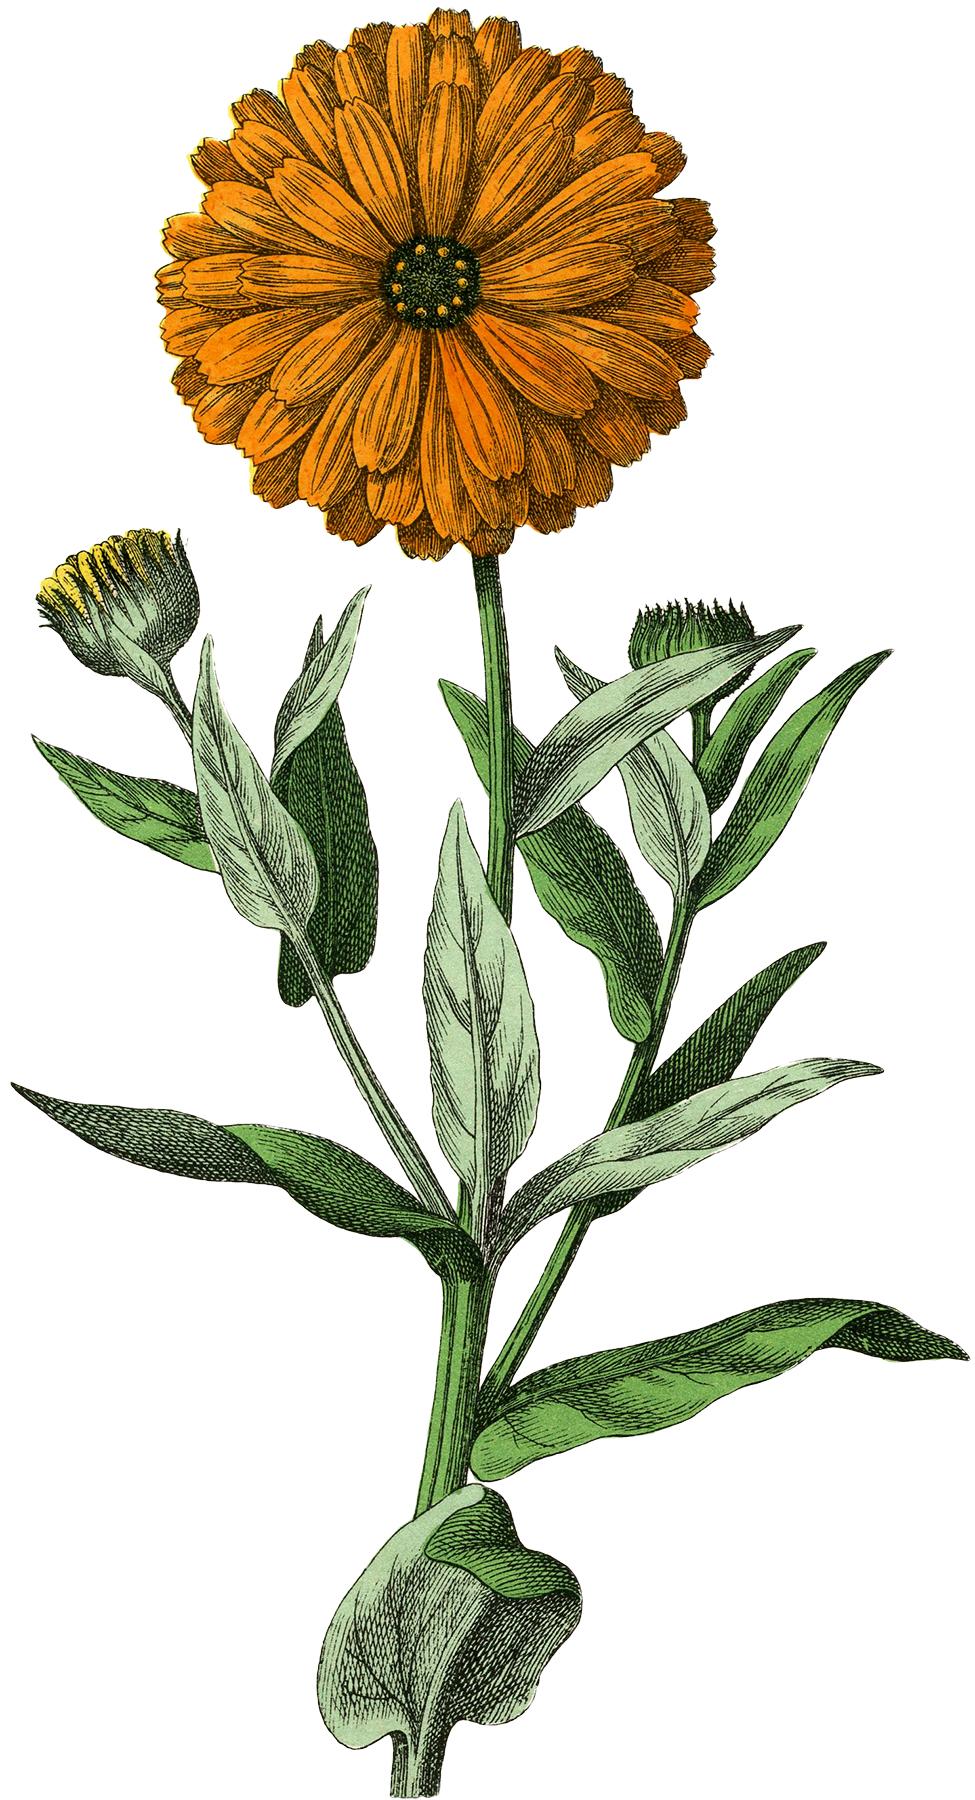 Botanical marigold image the graphics fairy - The graphics fairy ...